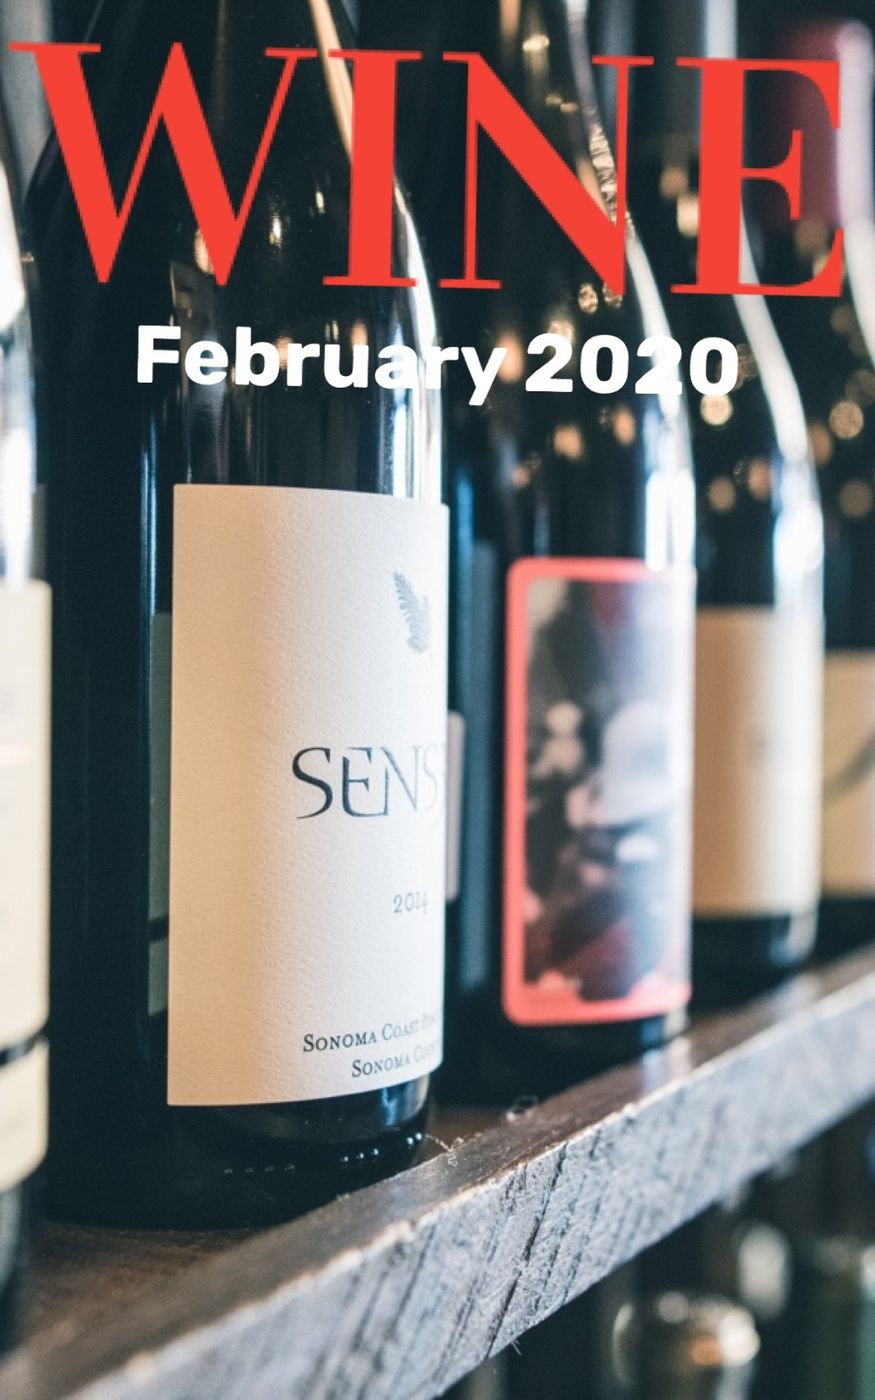 WINE February 2020